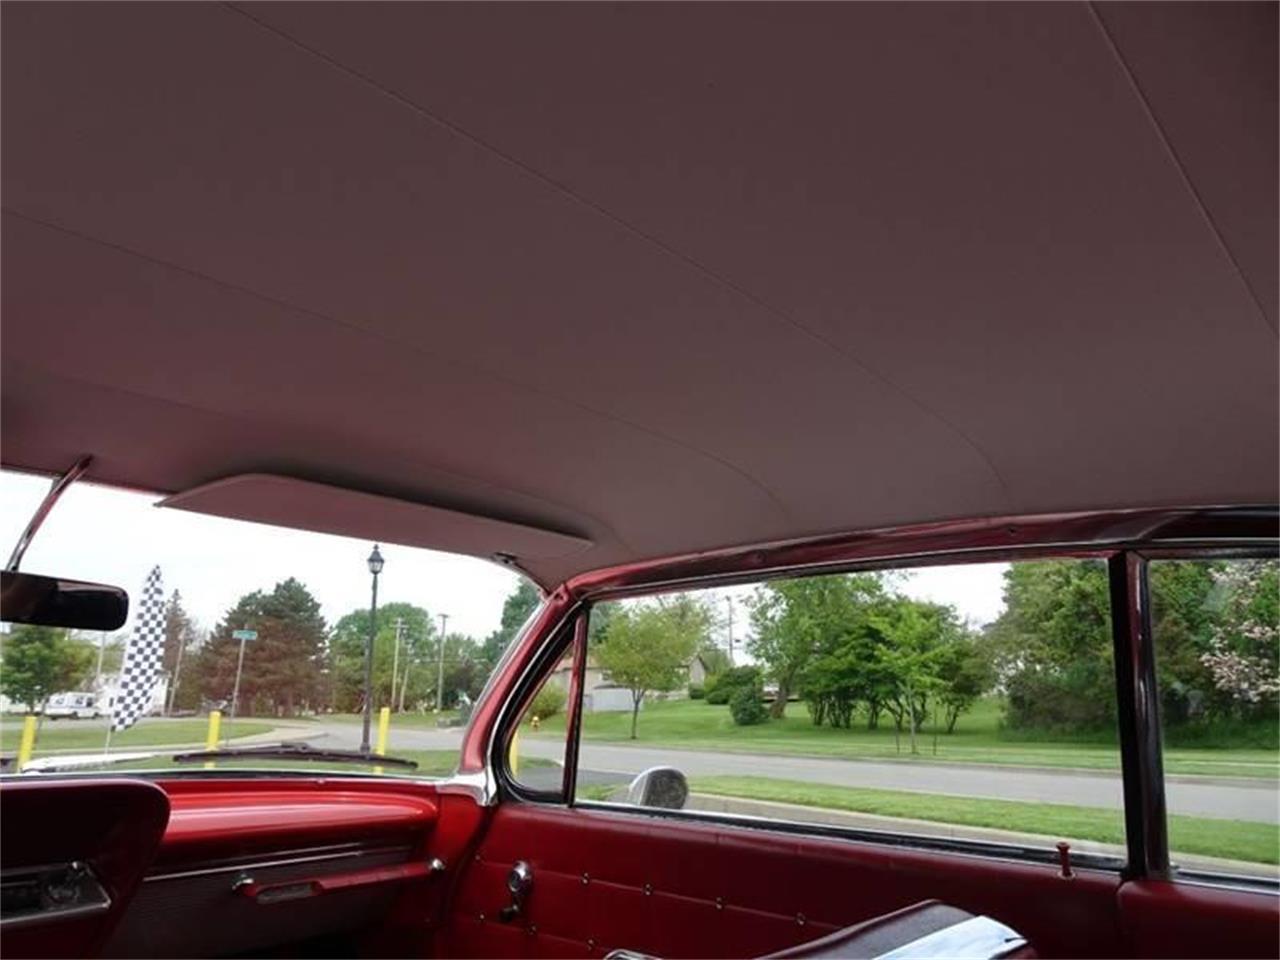 1962 Chevrolet Impala (CC-1223871) for sale in Hilton, New York